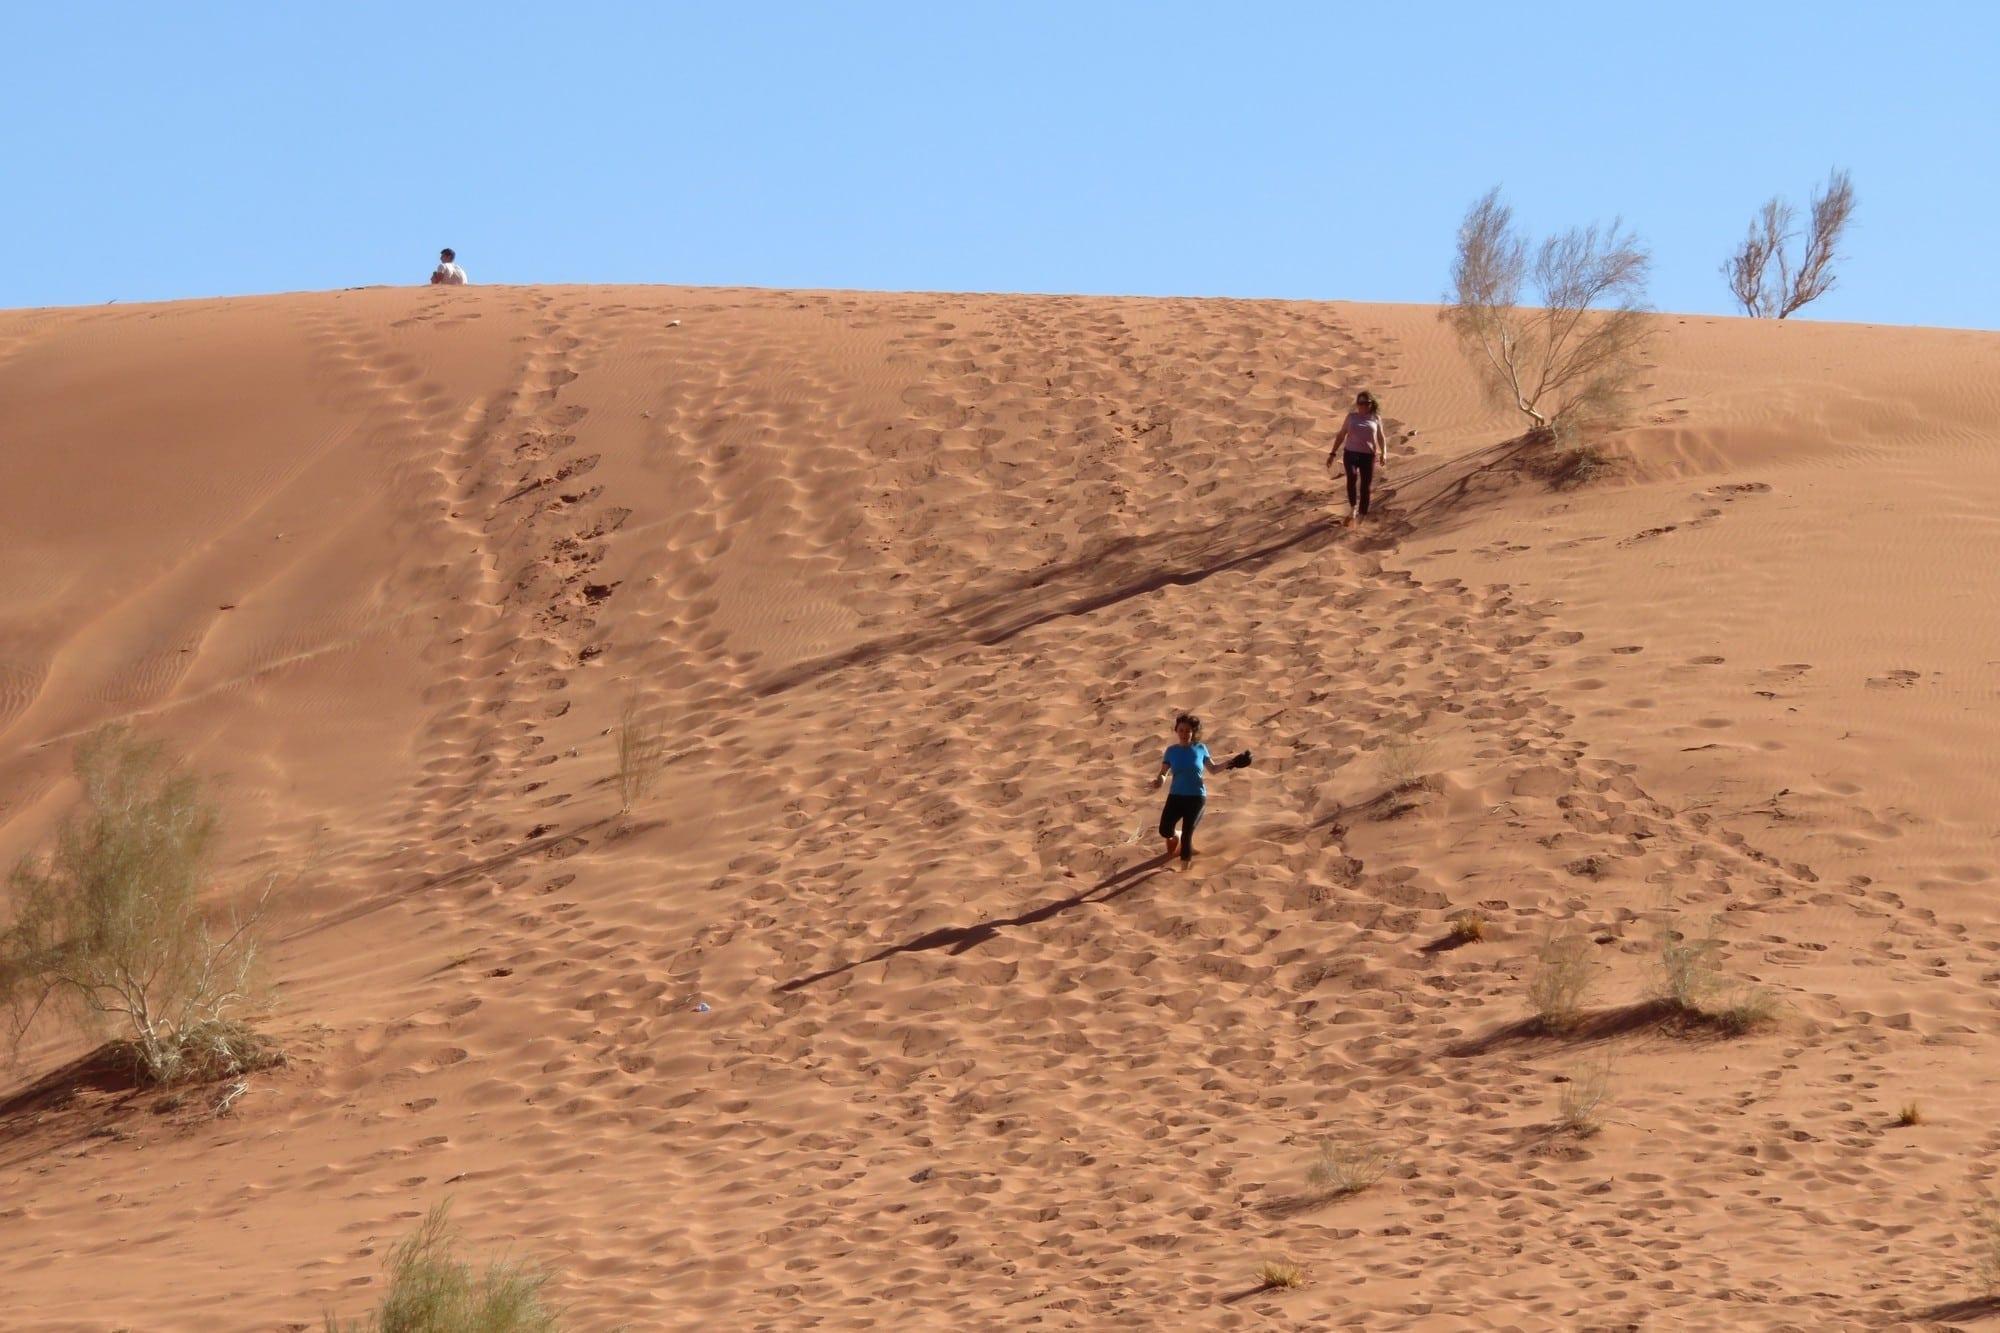 Wadi Rum - ואדי ראם ירדן - ערוצים בטבע - דיונות החול